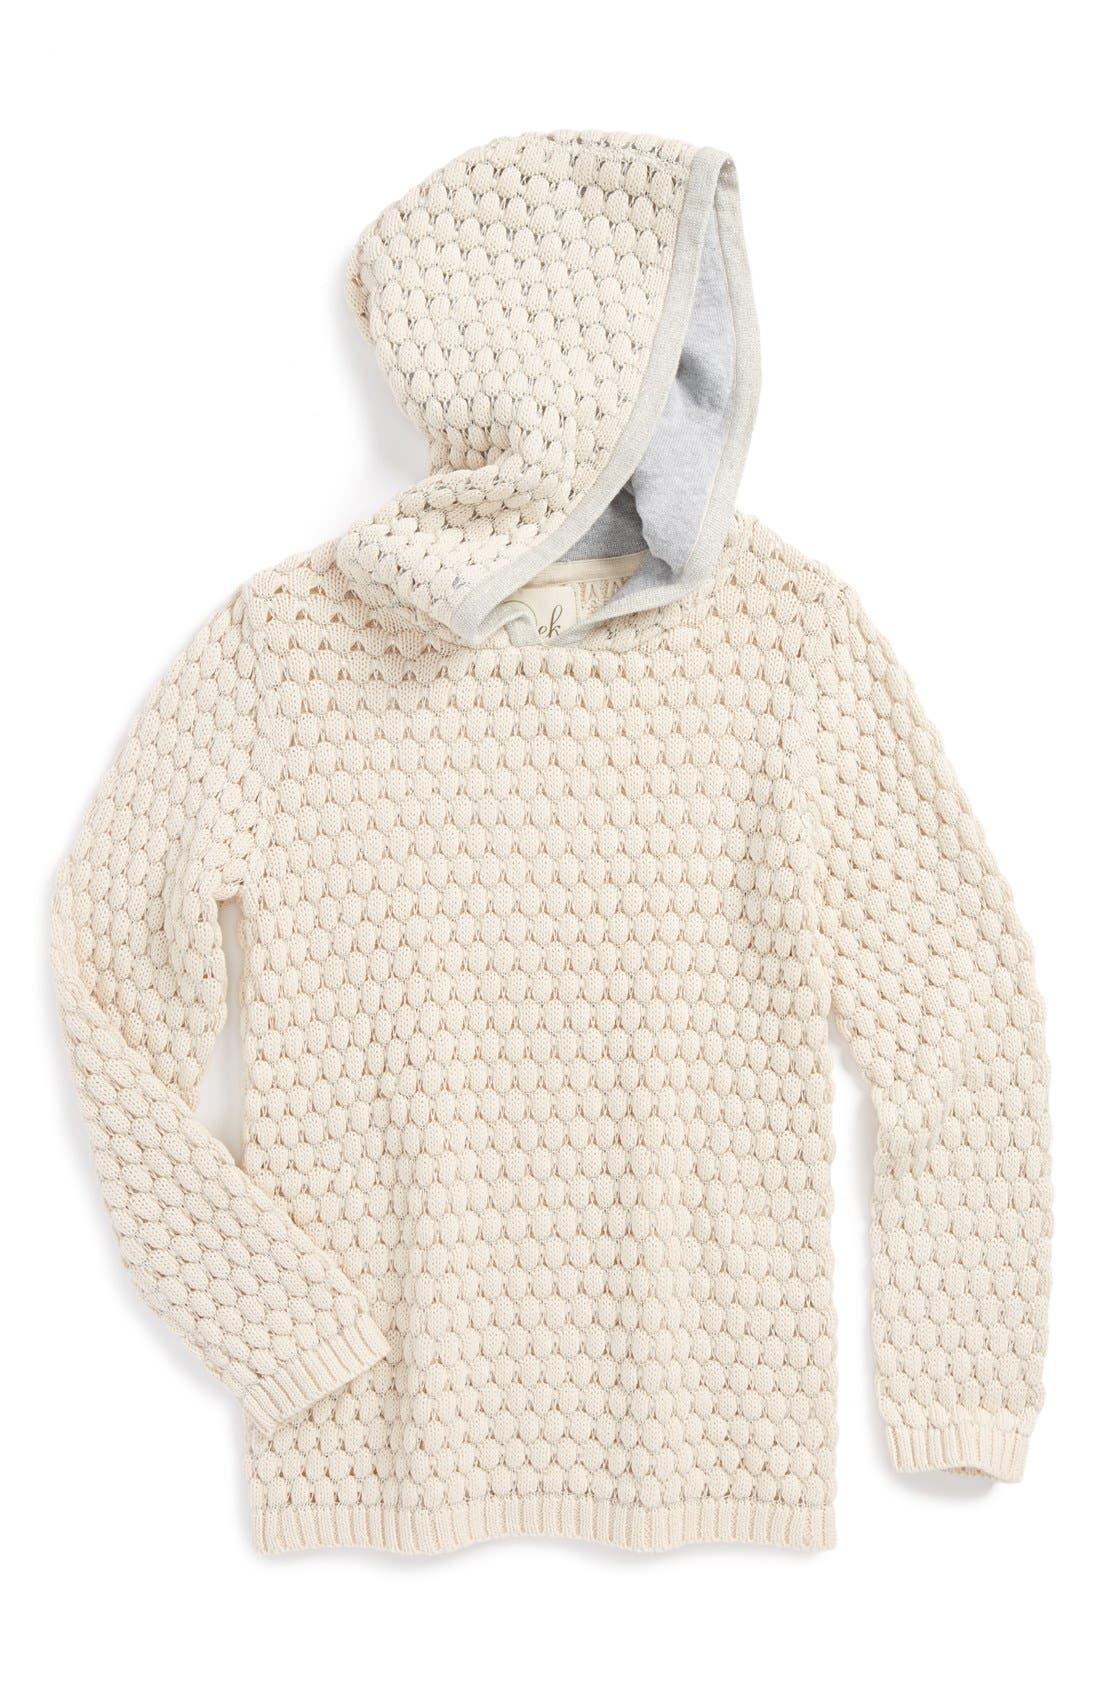 Alternate Image 1 Selected - Peek 'Gia' Metallic Loose Knit Hoodie (Baby Girls)